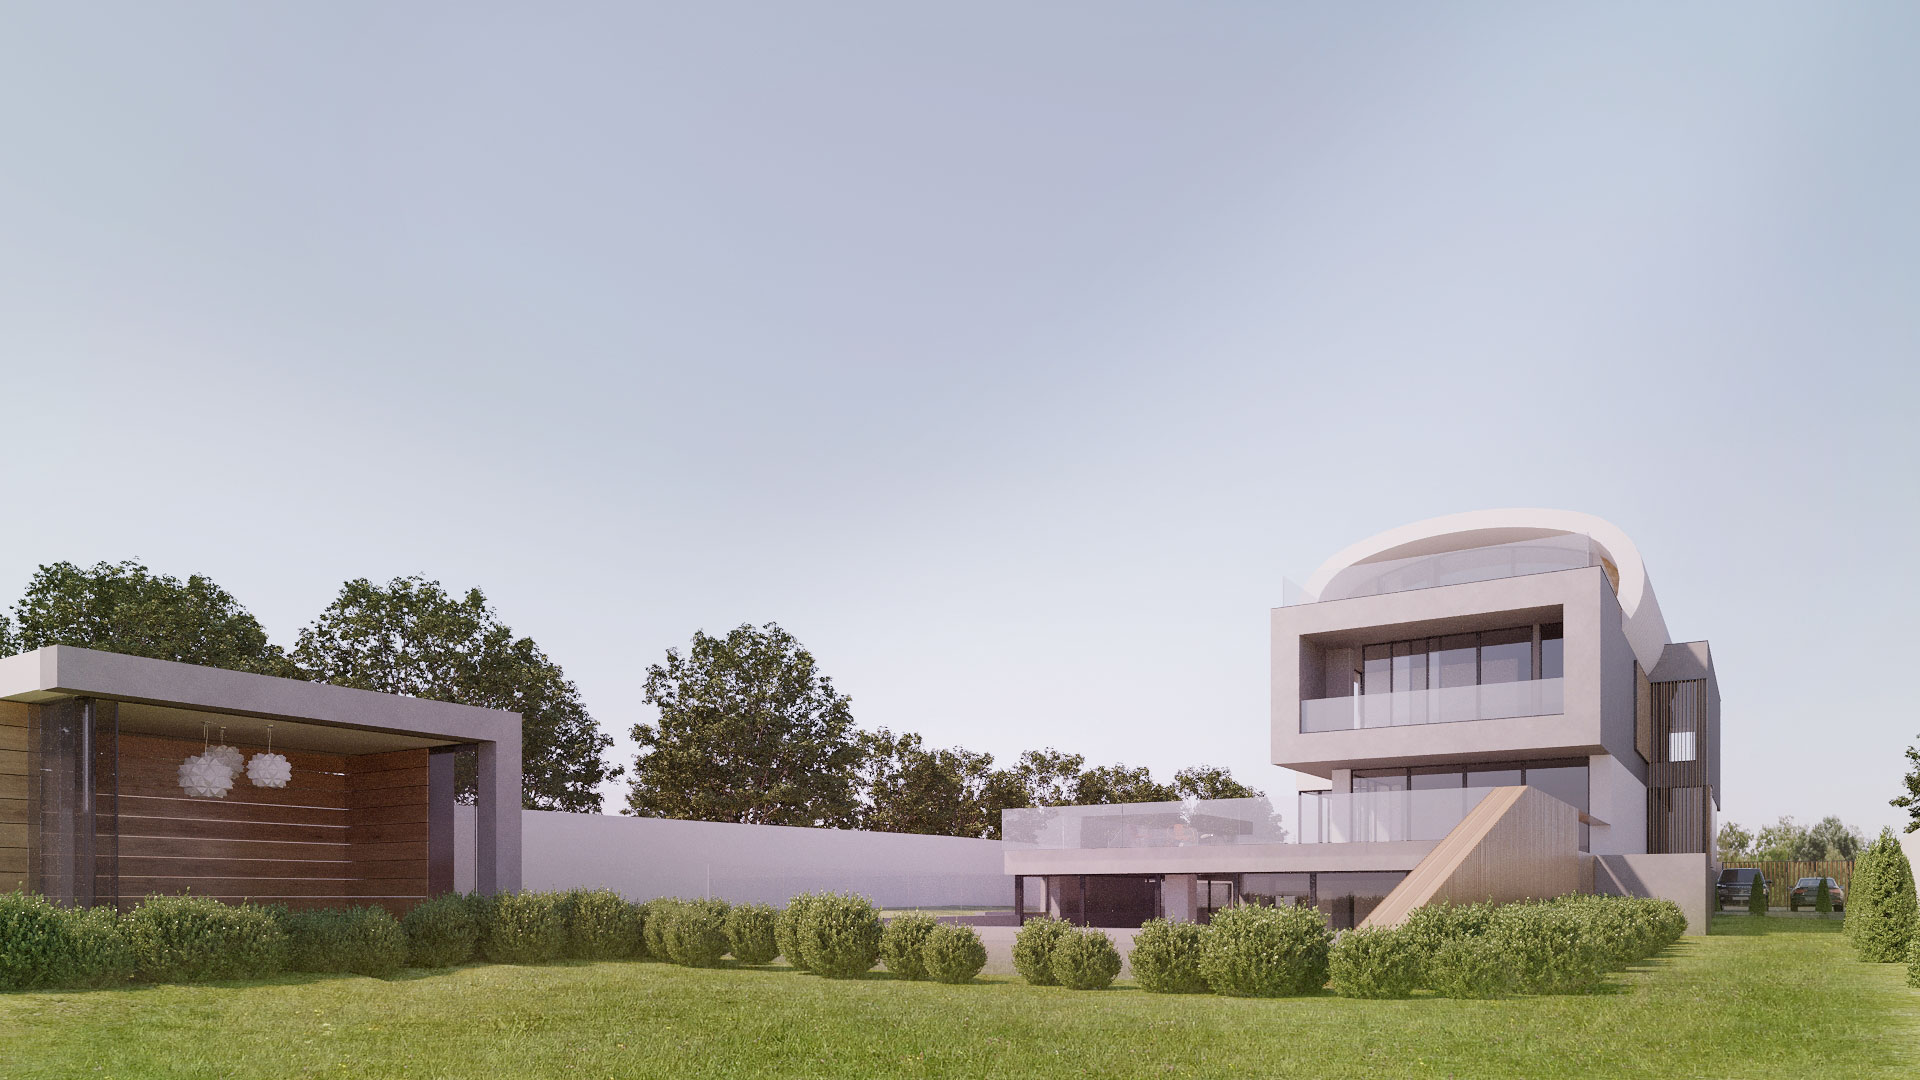 https://nbc-arhitect.ro/wp-content/uploads/2020/10/NBC-Arhitect-_-residences-_-Mogo-Villa-2-_-Romania-_-exterior-view_5.jpg